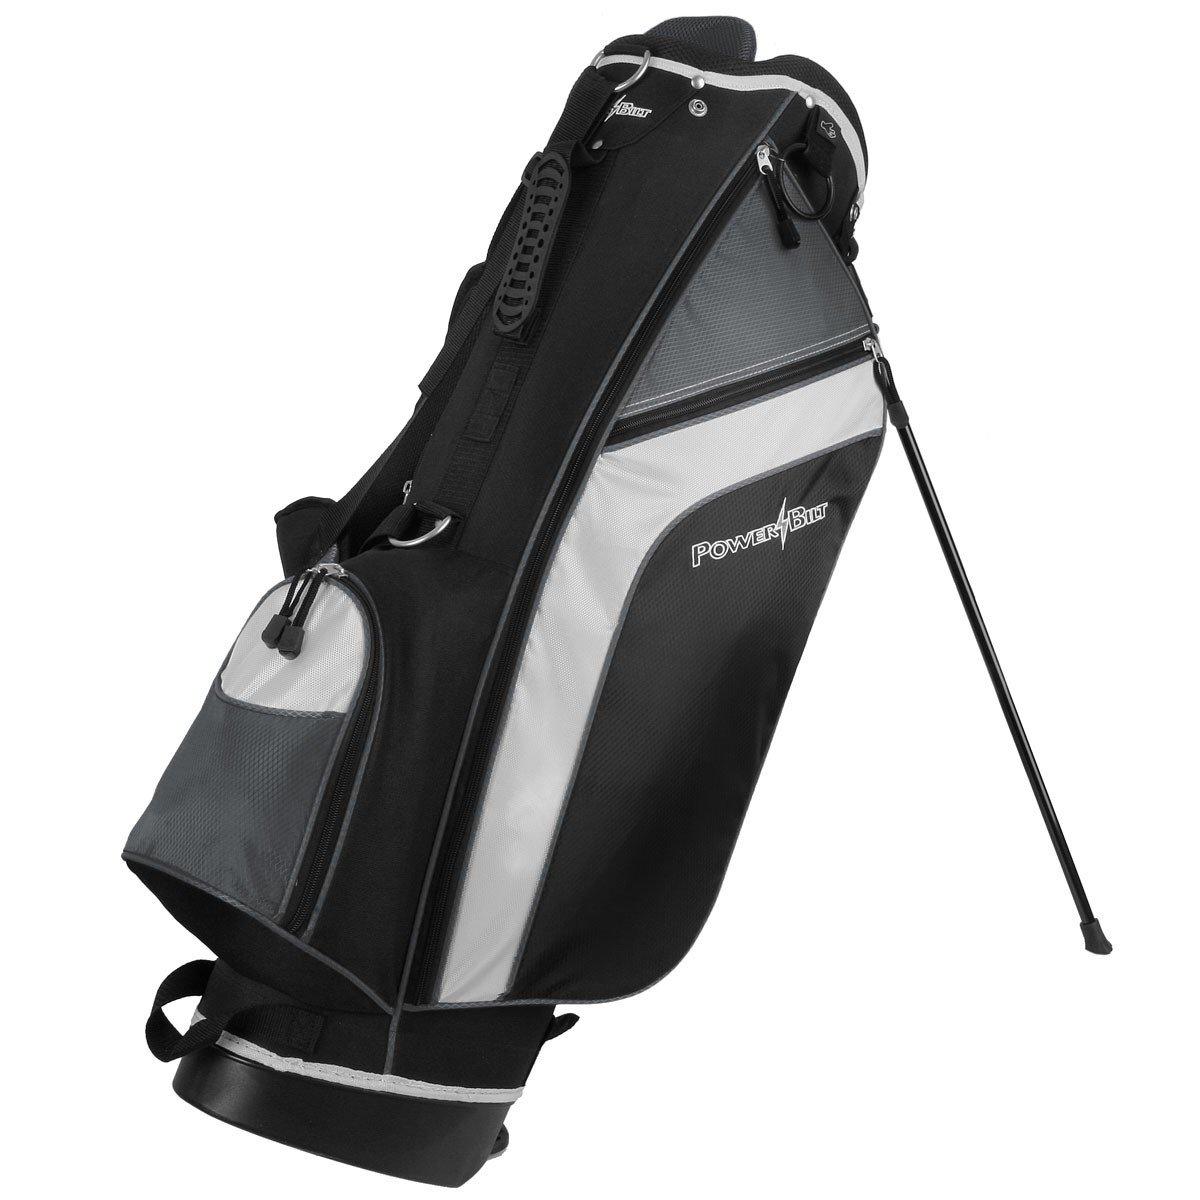 Powerbilt Santa Rosa Black/Charcoal Stand Golf Bag (Black/Charcoal) by PowerBilt